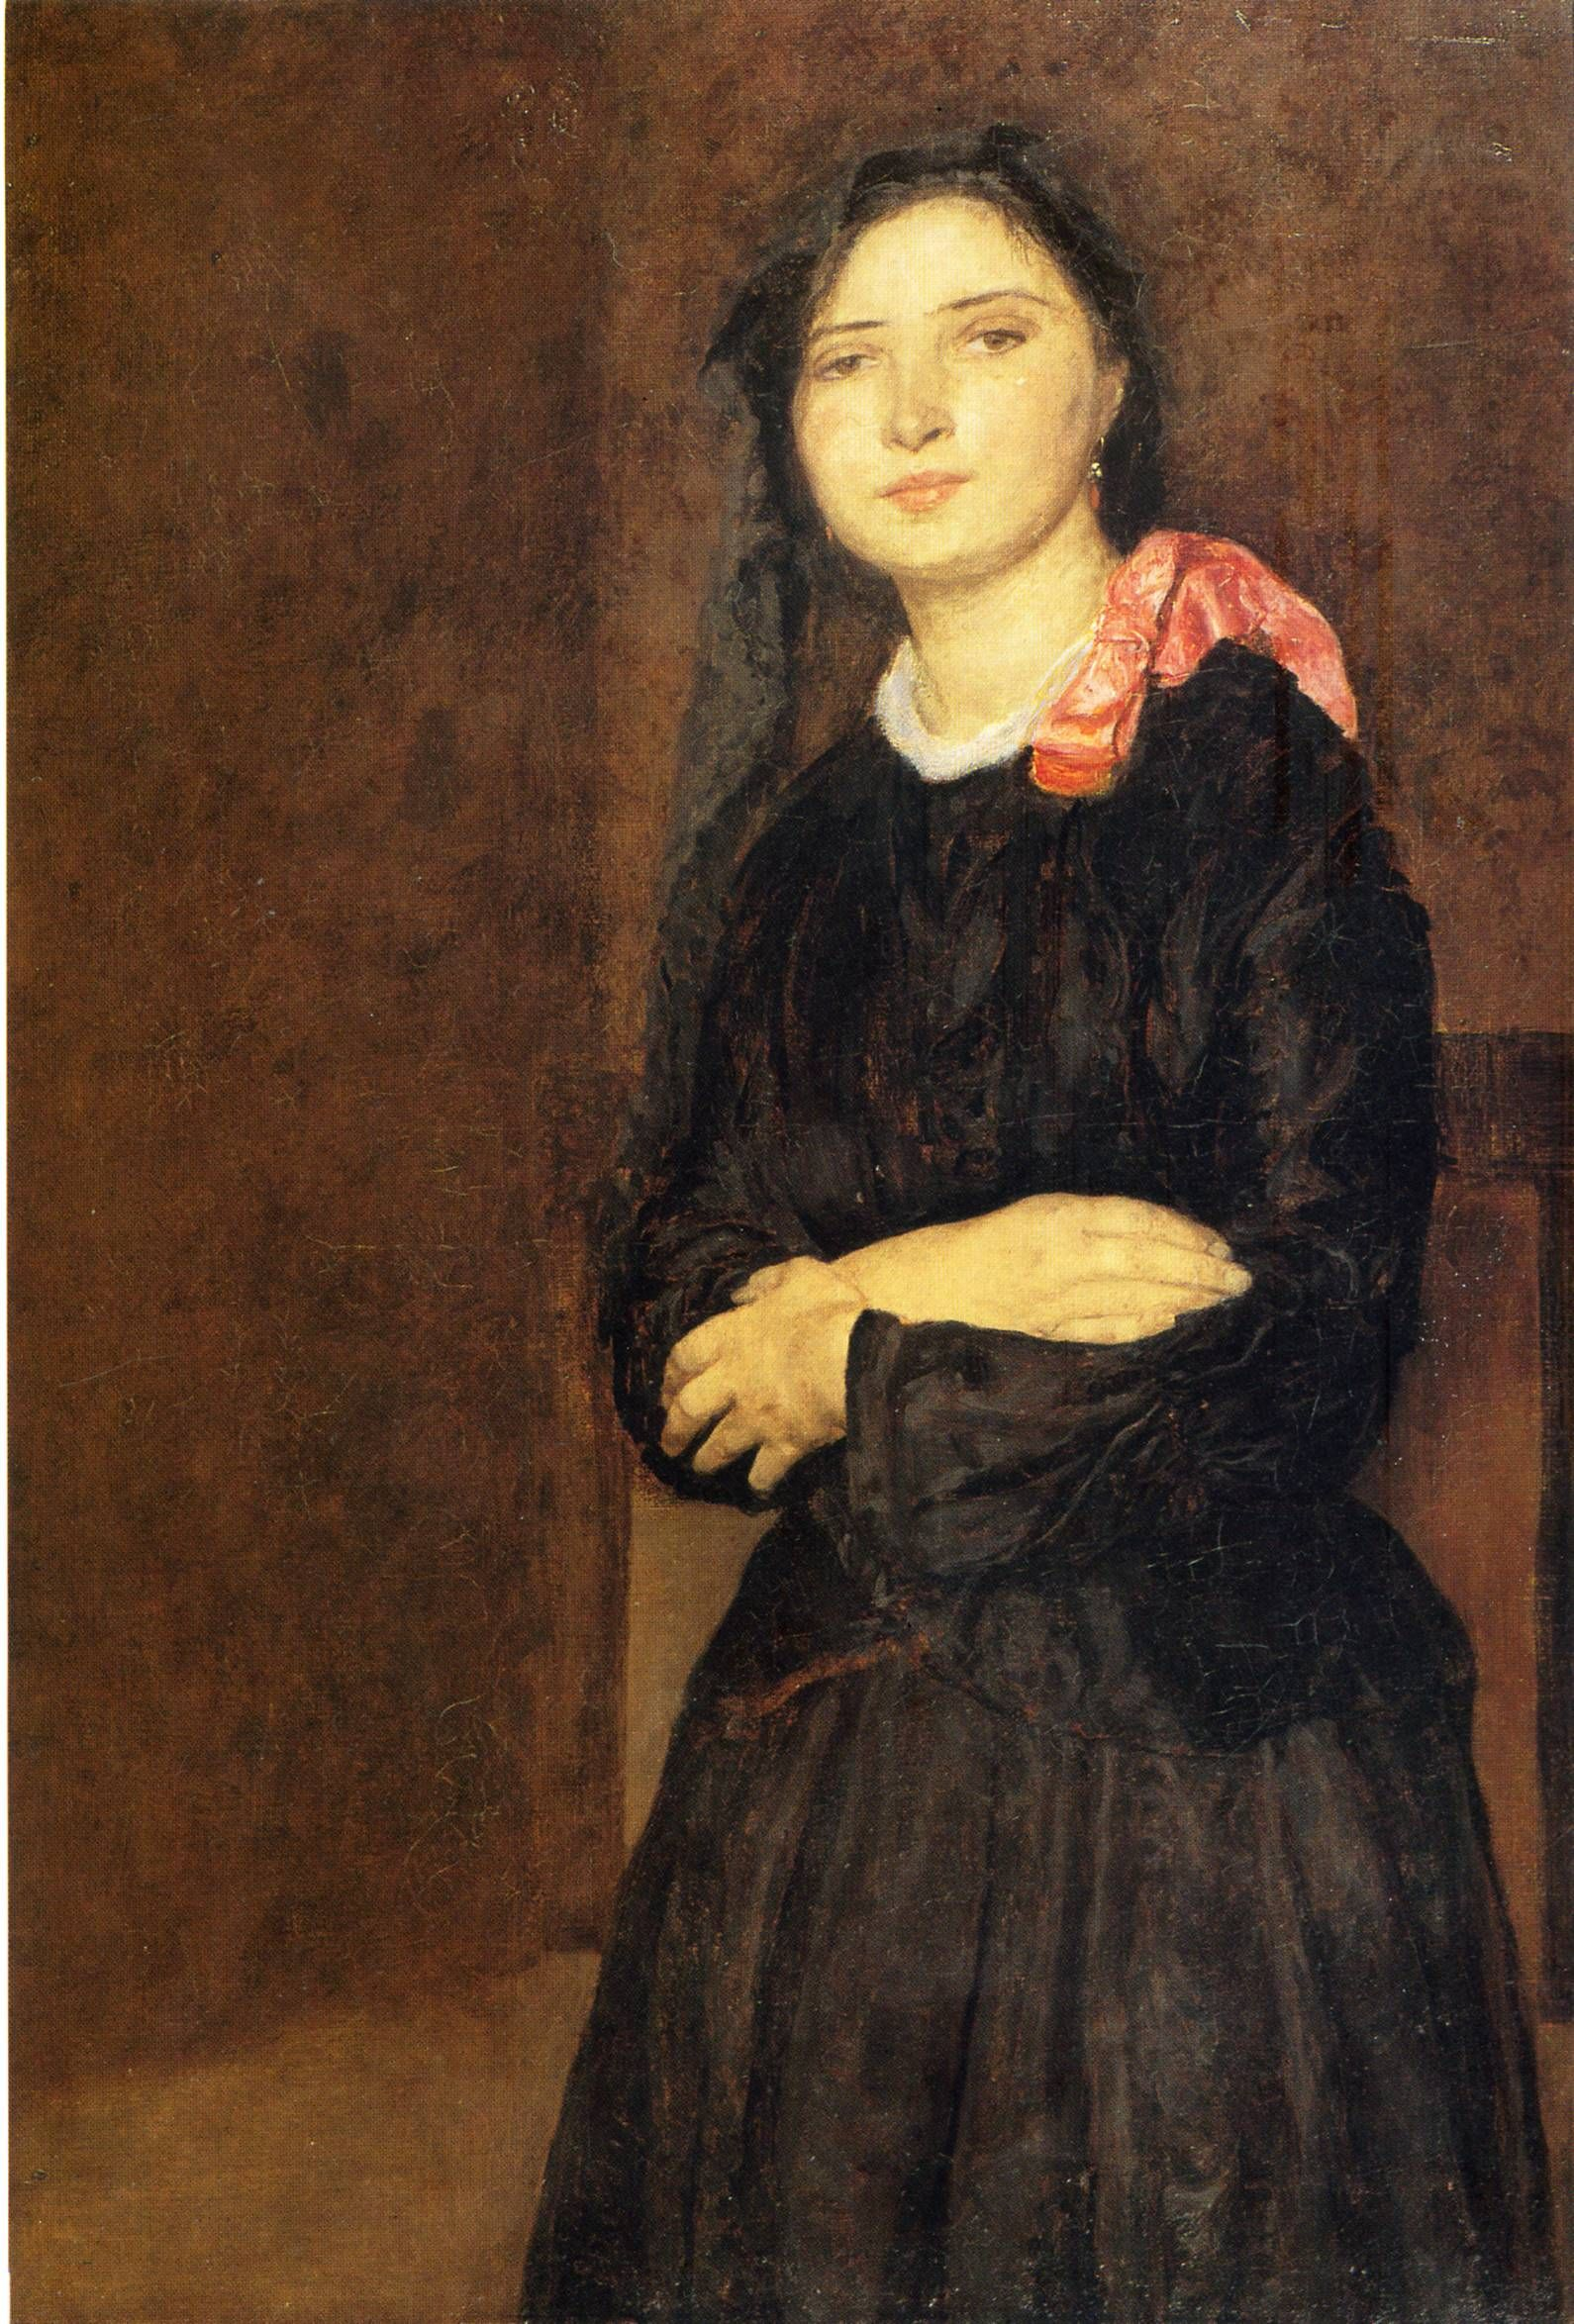 Dorelia In Black Dres - Gwen John. Artist Start Date .1903 1590 2348 Atelier